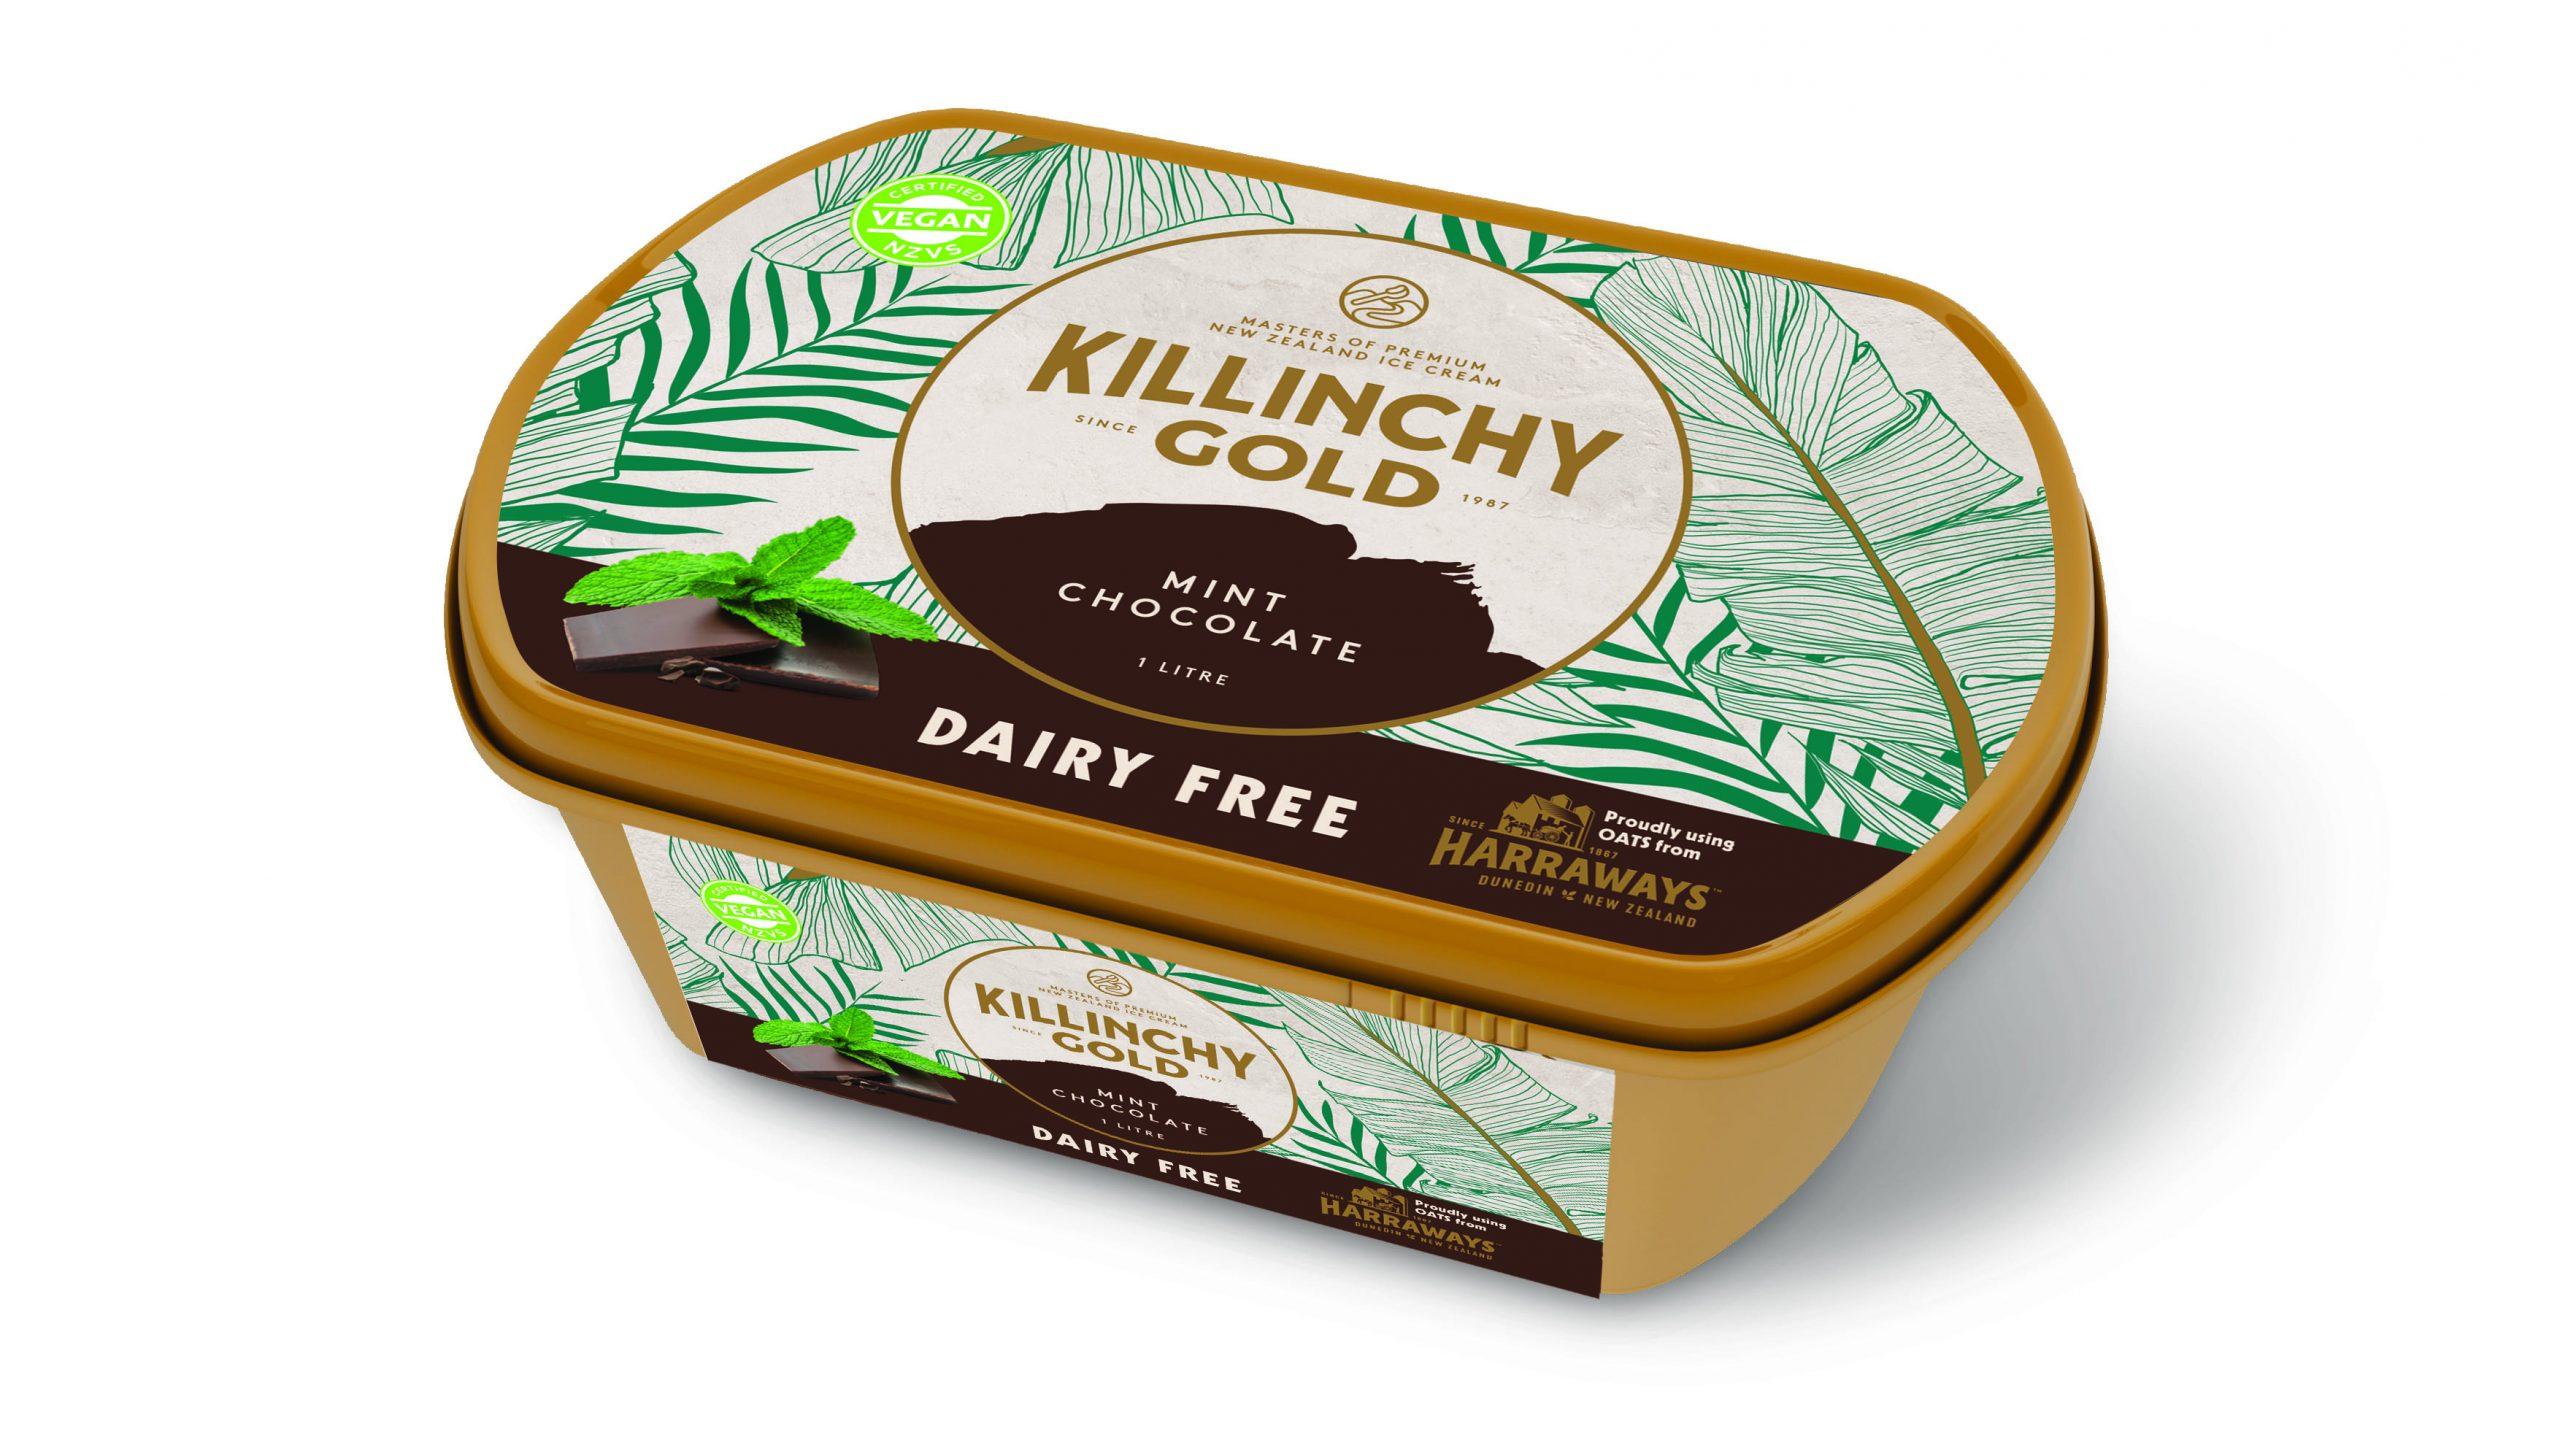 KG_DairyFree_1L_Tub_3D_MintChocolate